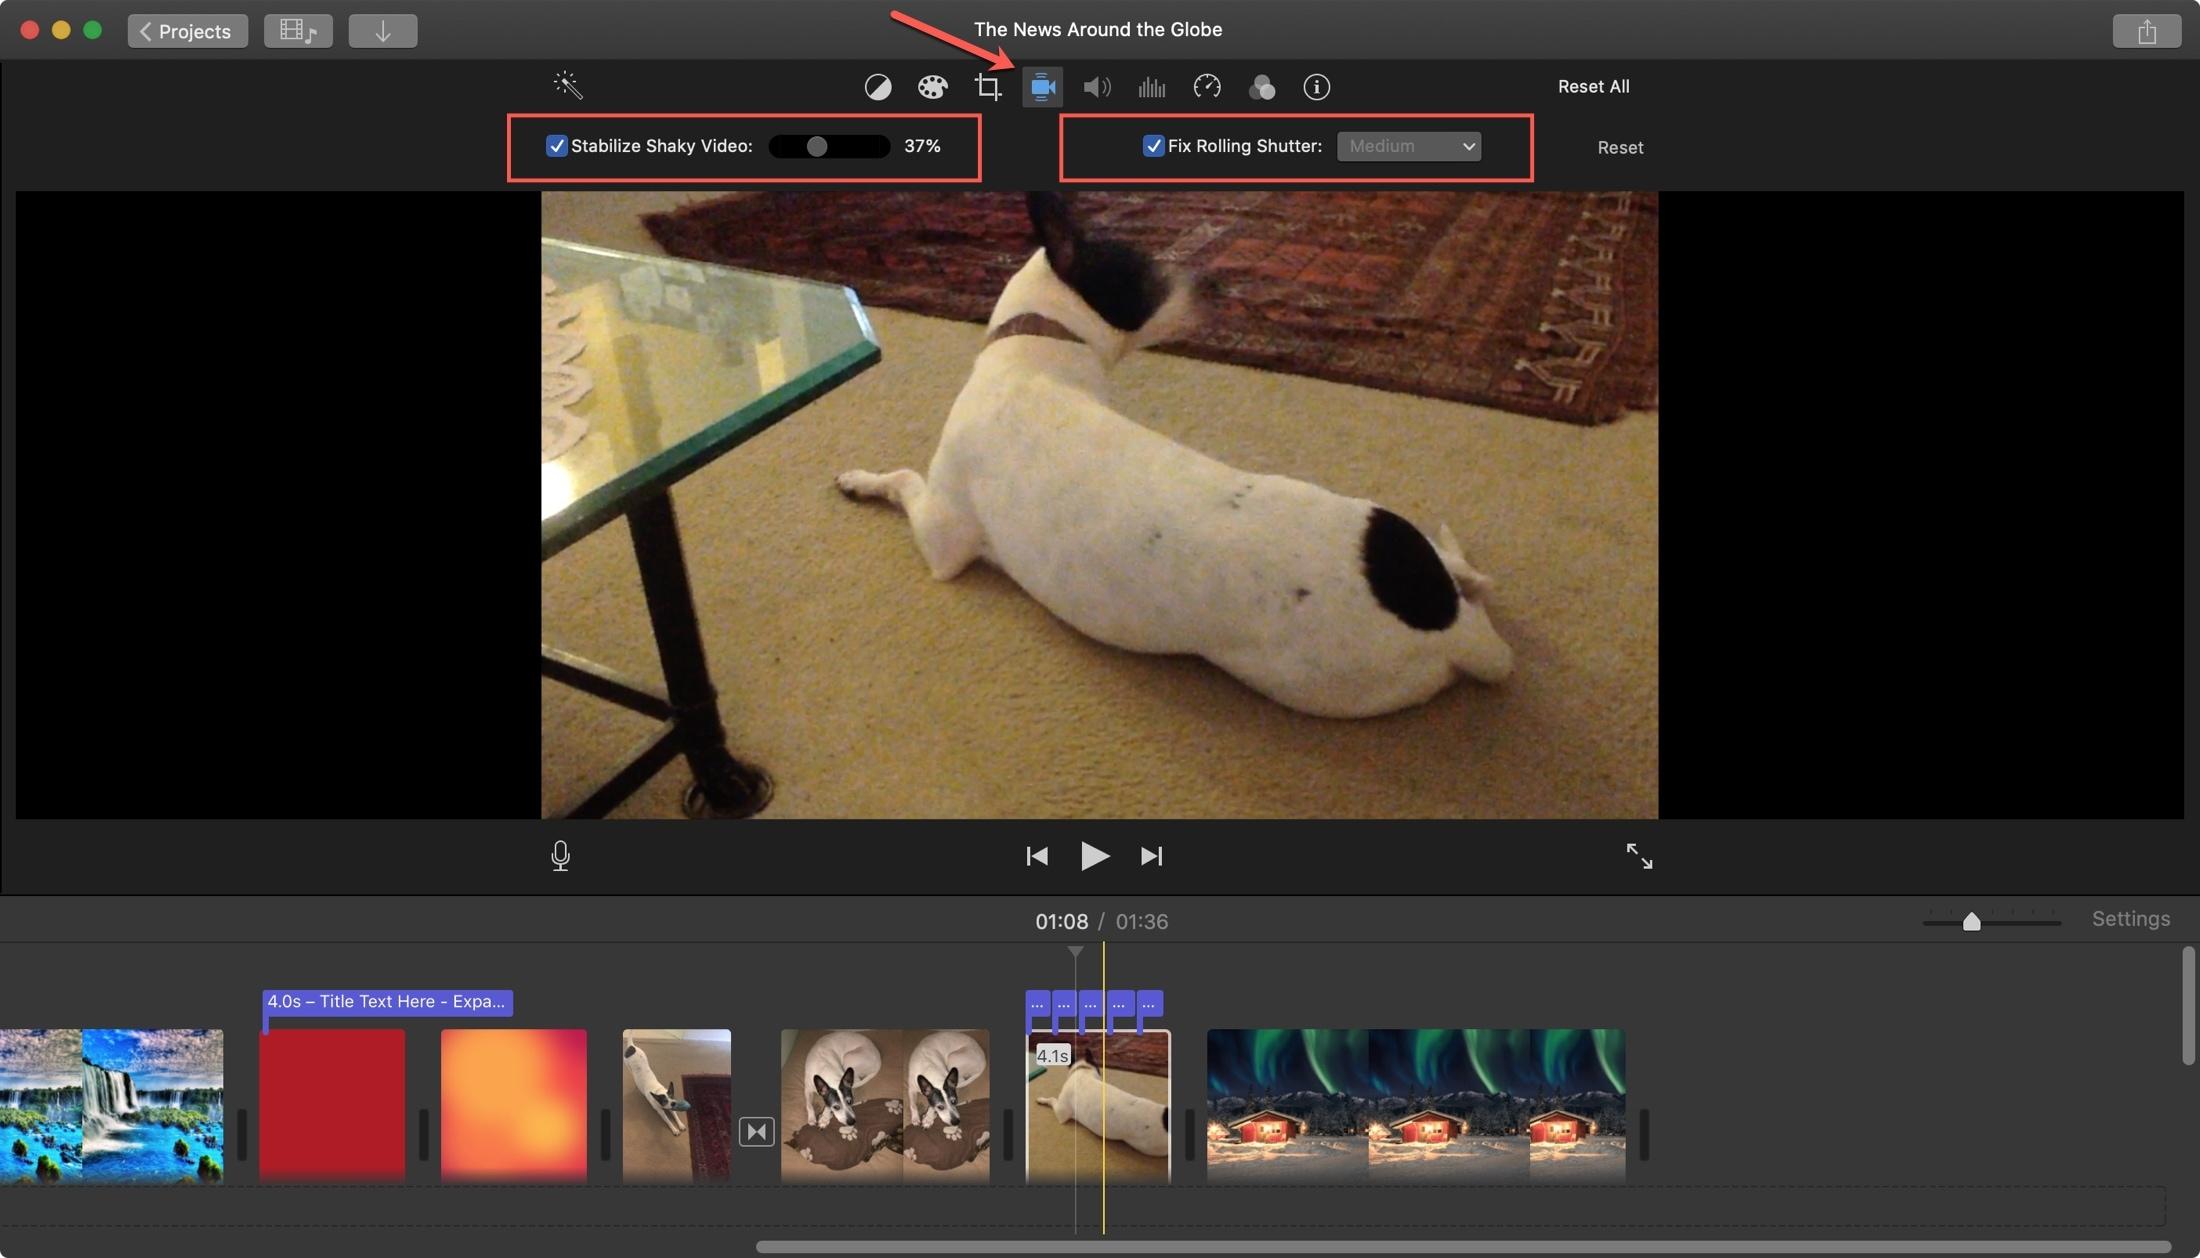 Shaky video and rolling shutter iMovie Mac